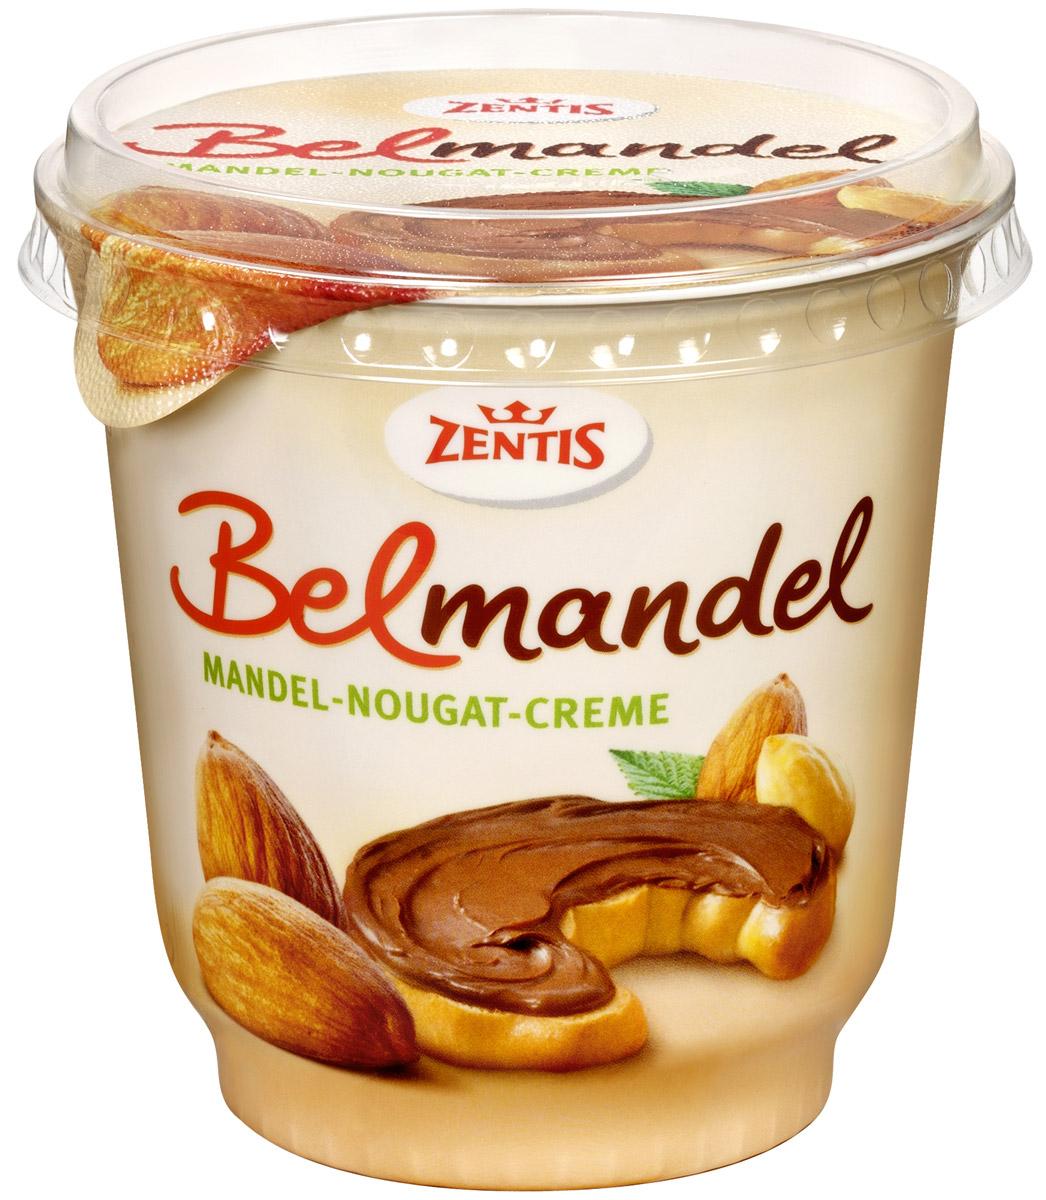 Zentis Belmandel шоколадная паста с миндалем и какао, 400 г